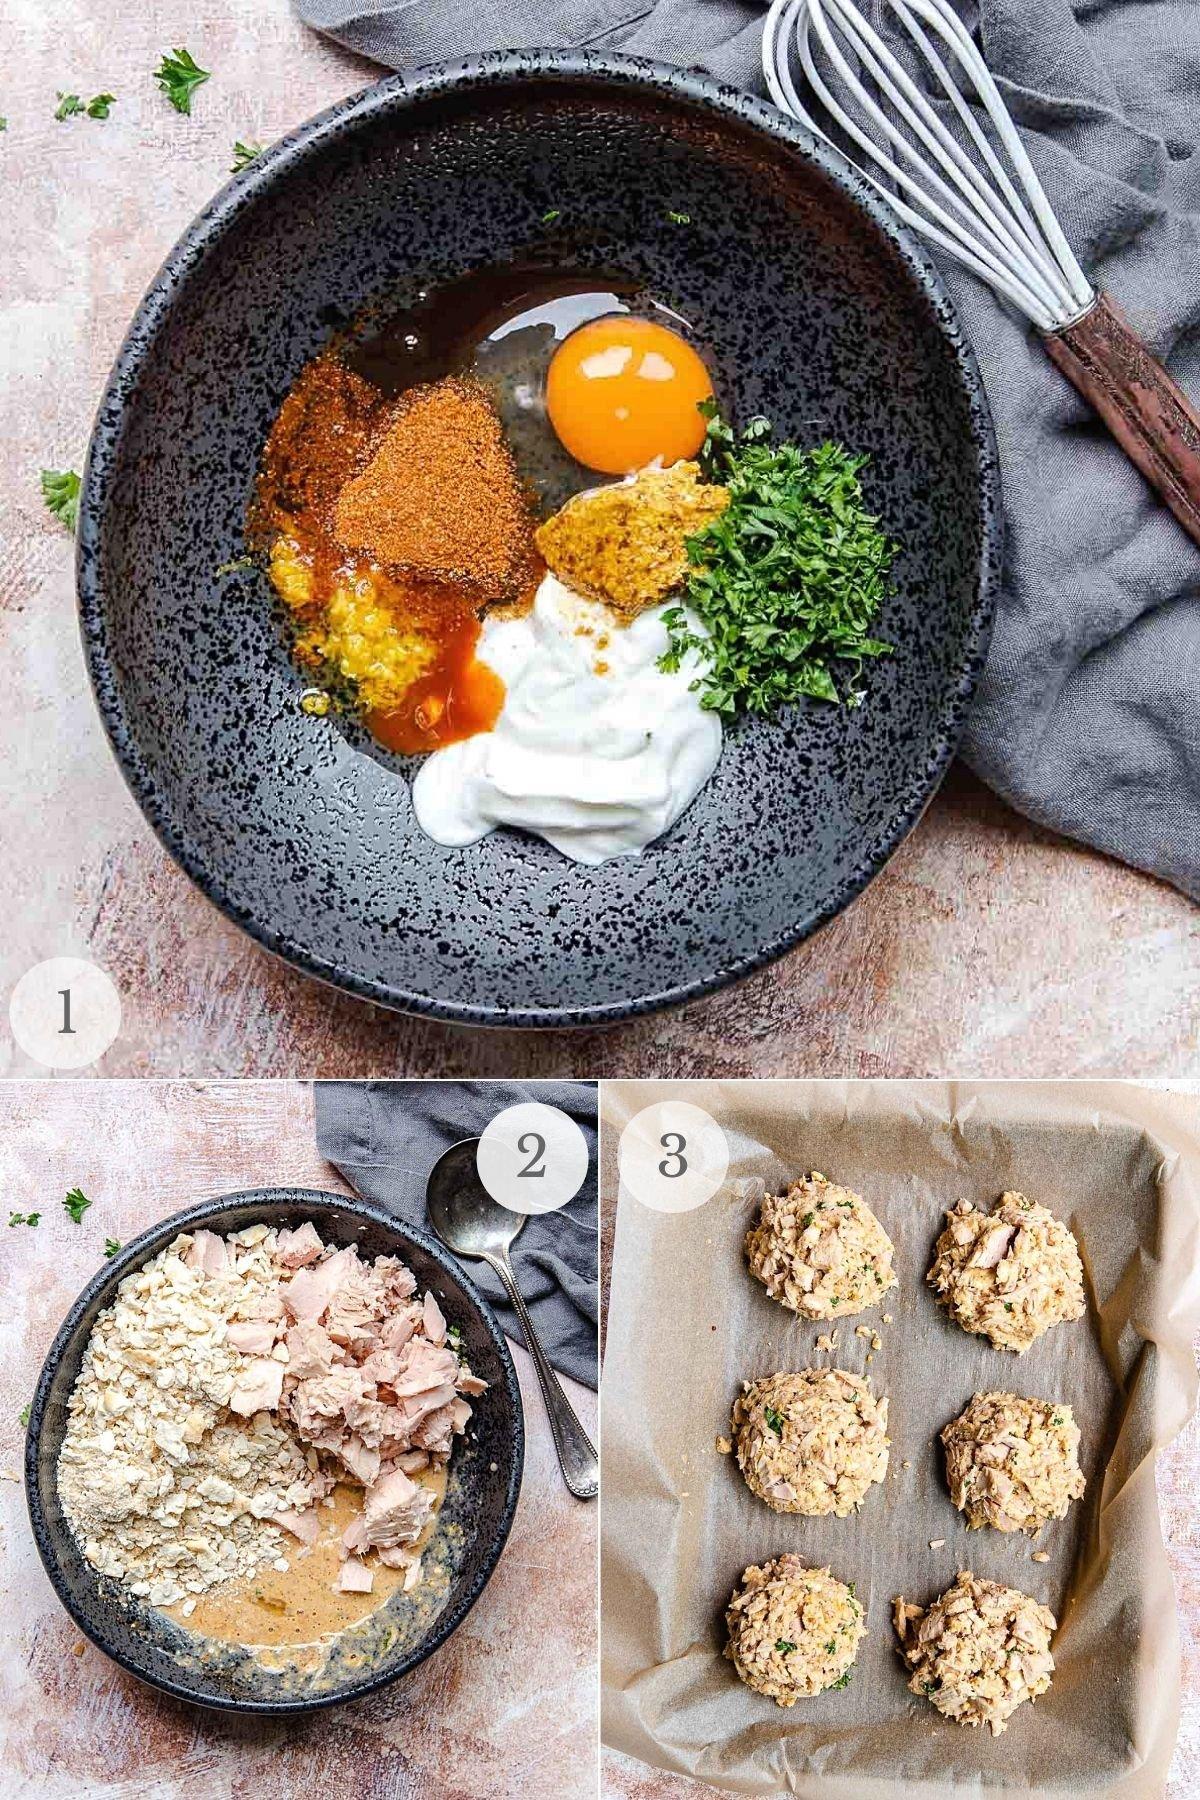 tuna cakes recipe steps 1-3